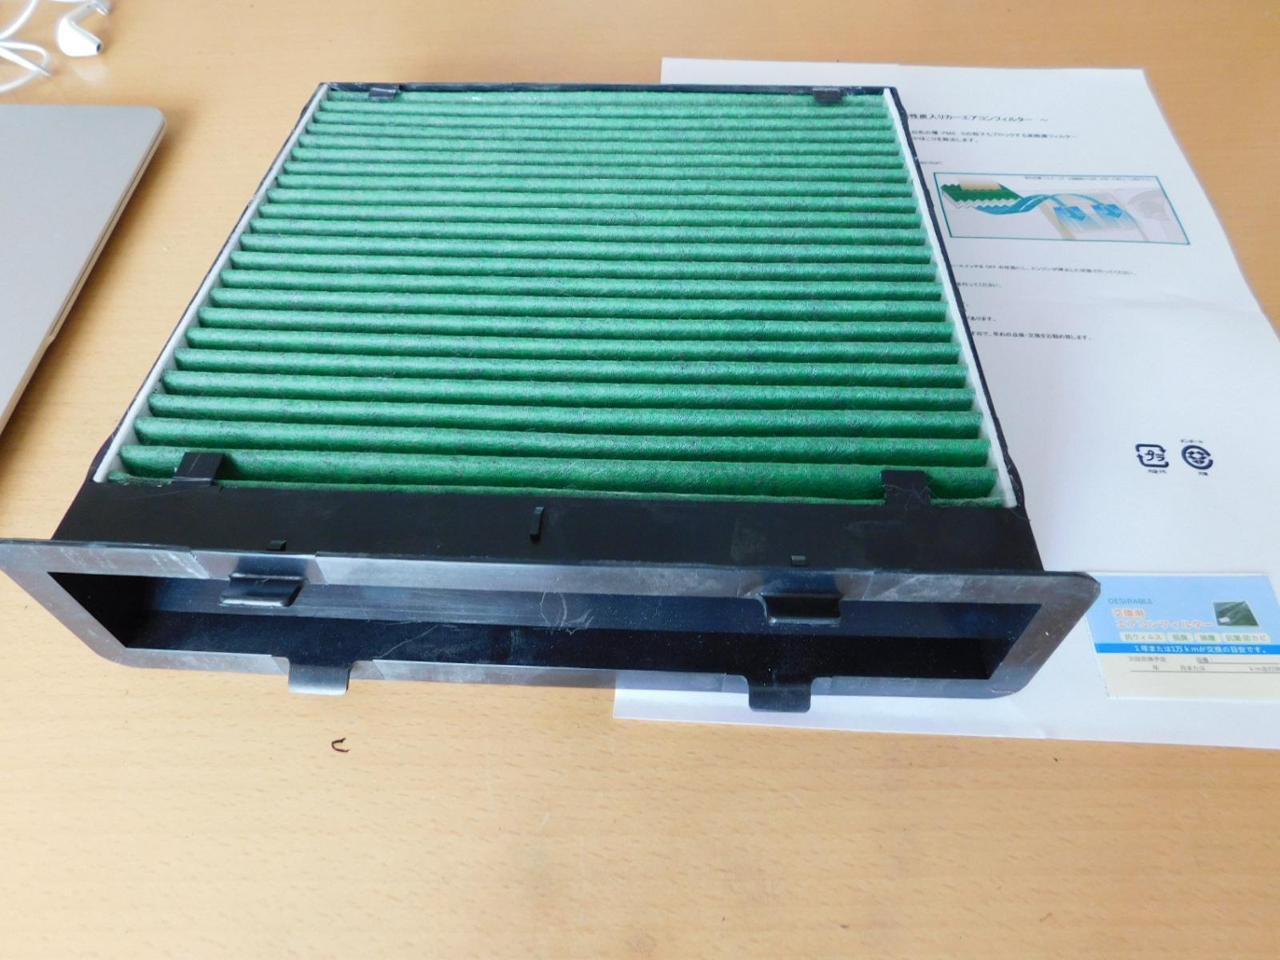 Desirable エアコンフィルター 特殊3層構造 活性炭入り